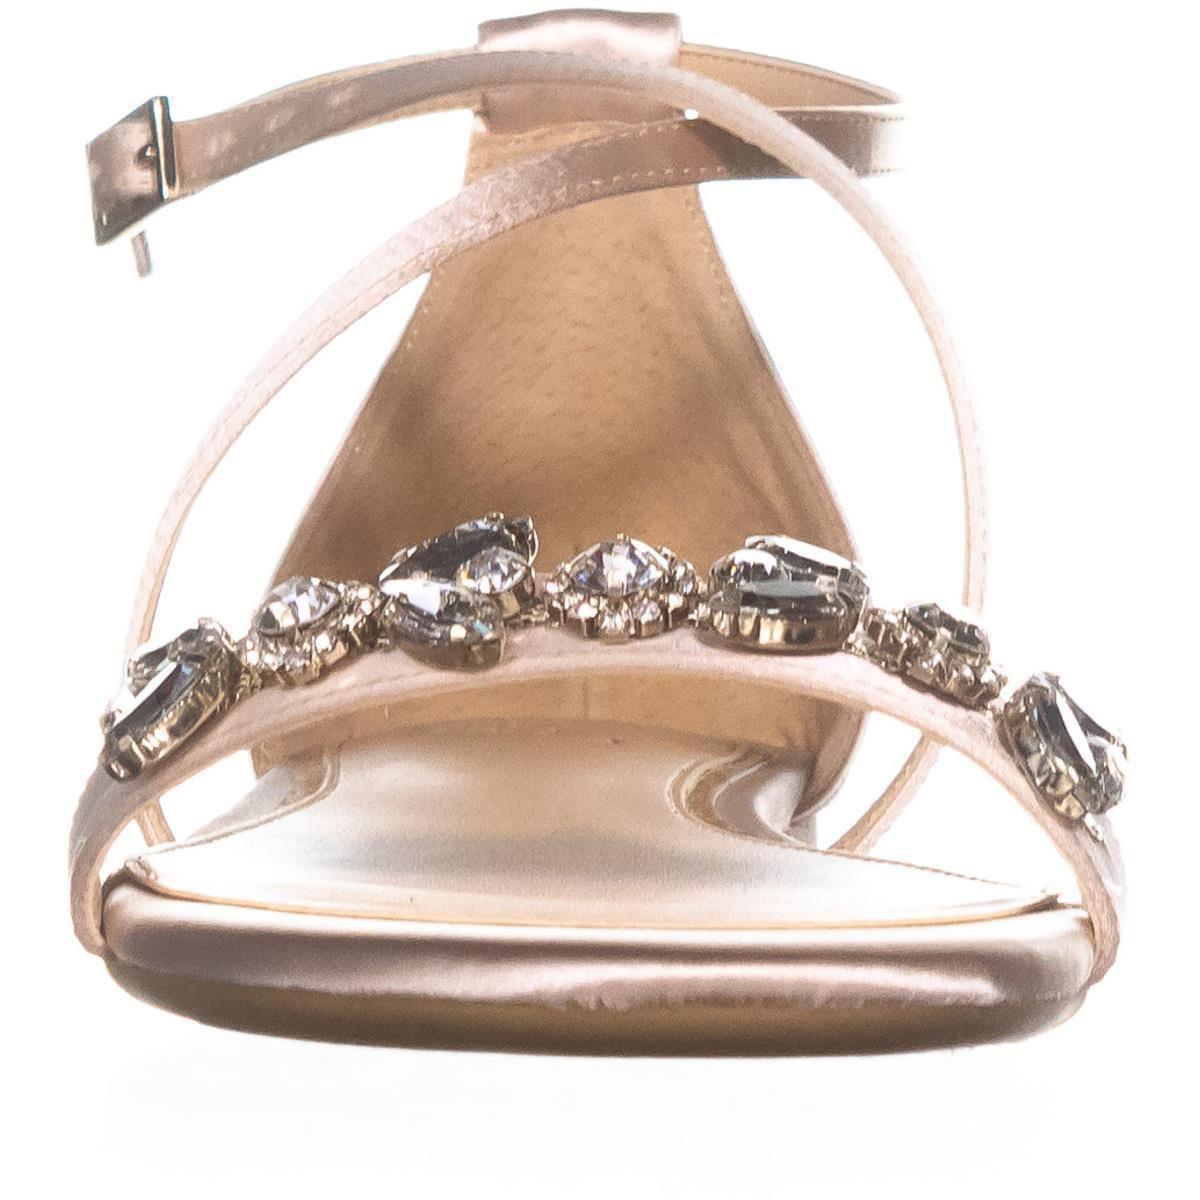 fd21e228b Lyst - Badgley Mischka Jewel By Tessy Rhinestone Sandals